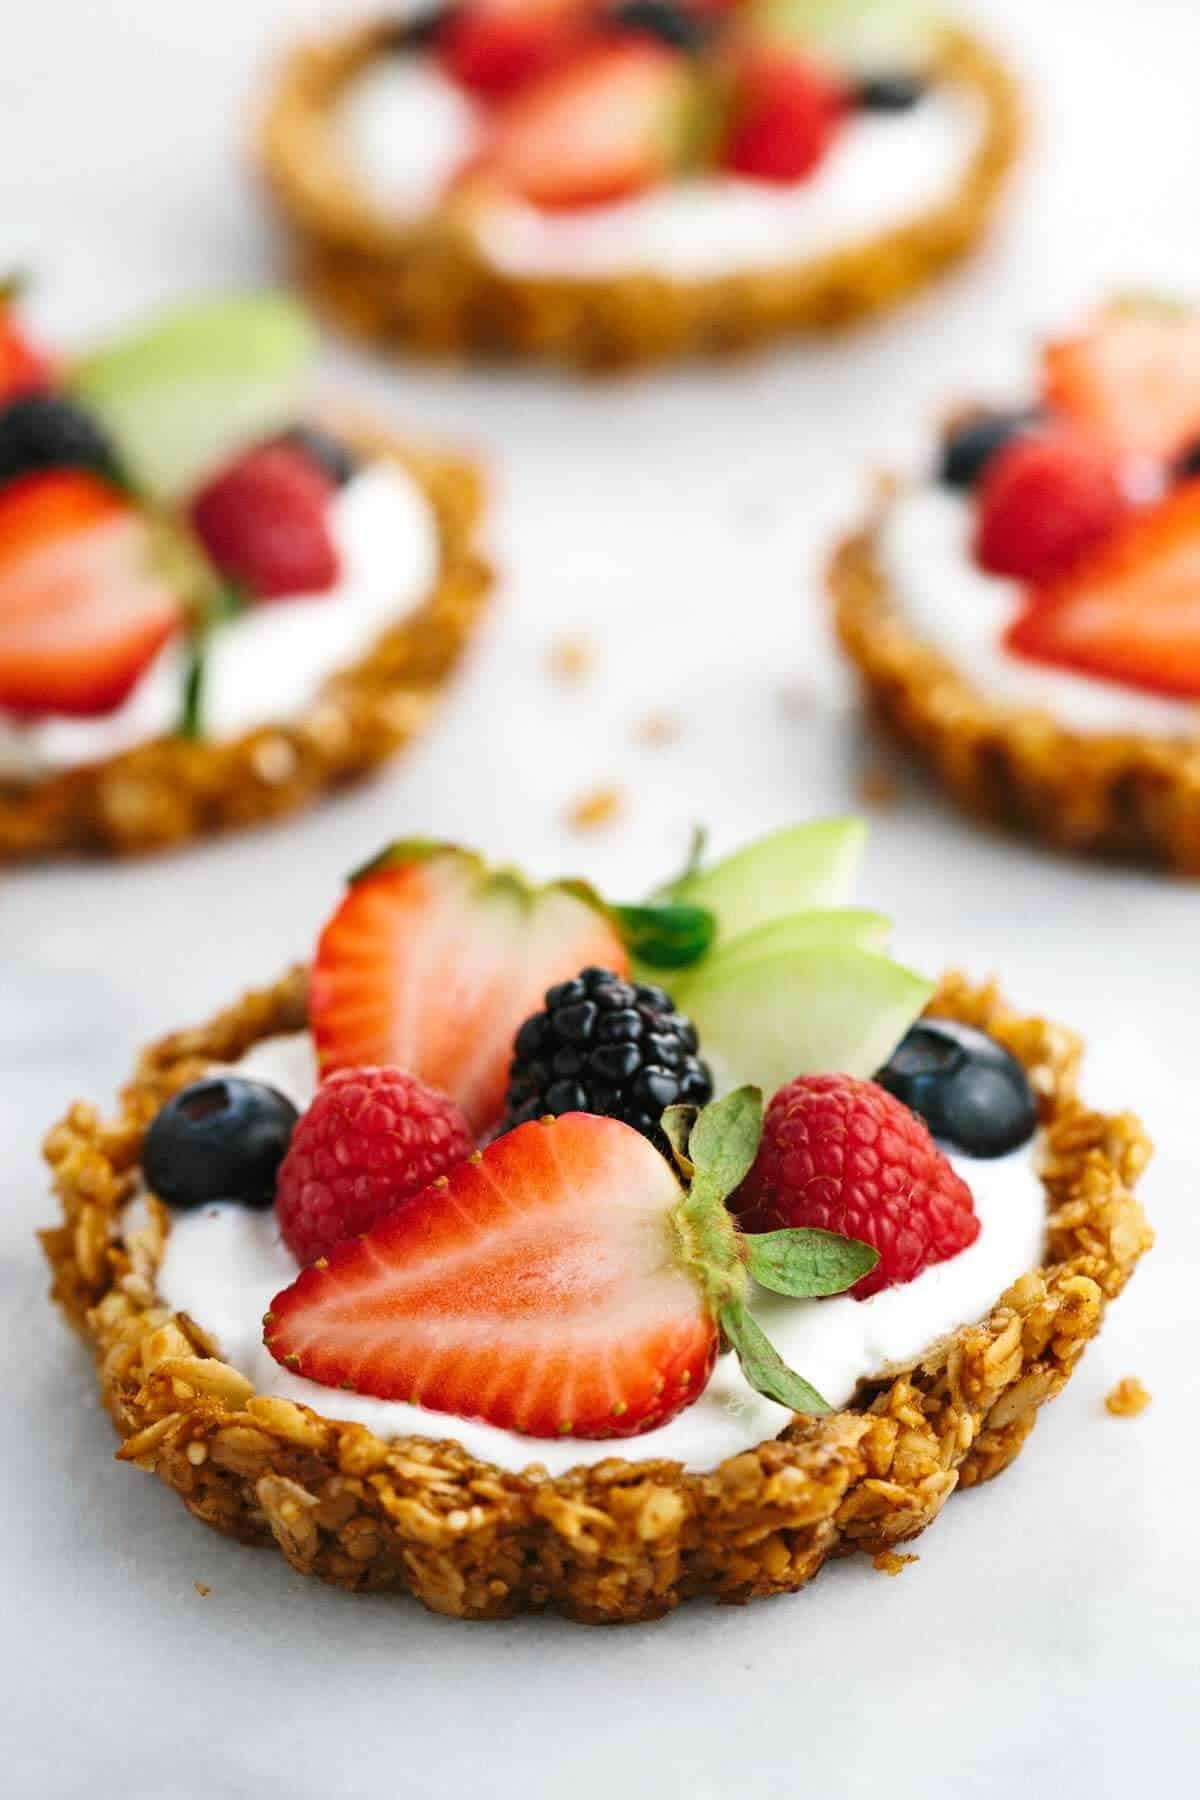 Fruit Breakfast Recipes  Breakfast Granola Fruit Tart with Yogurt Recipe